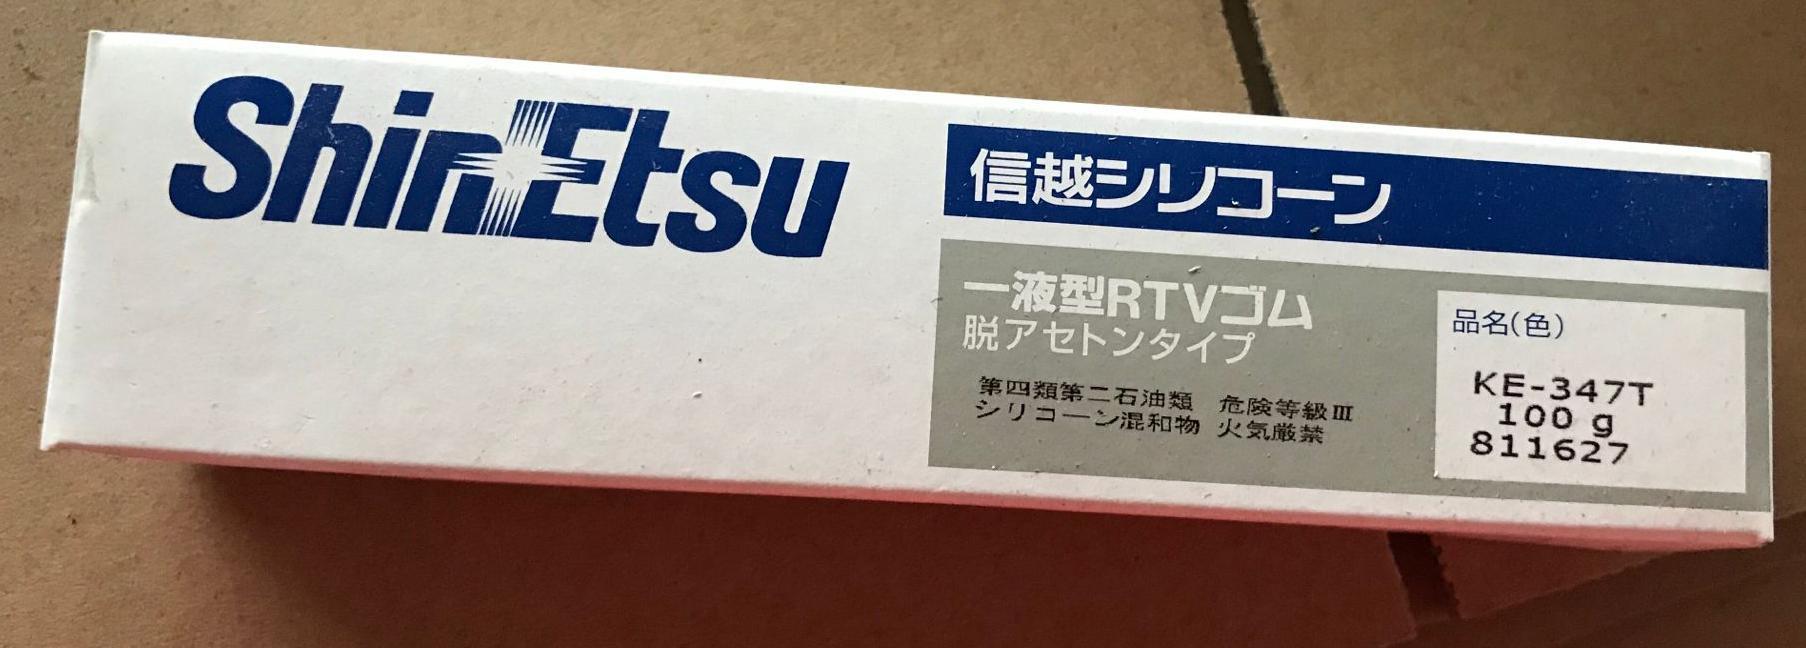 一液型RTV KE-347-T/B/W 100g 1